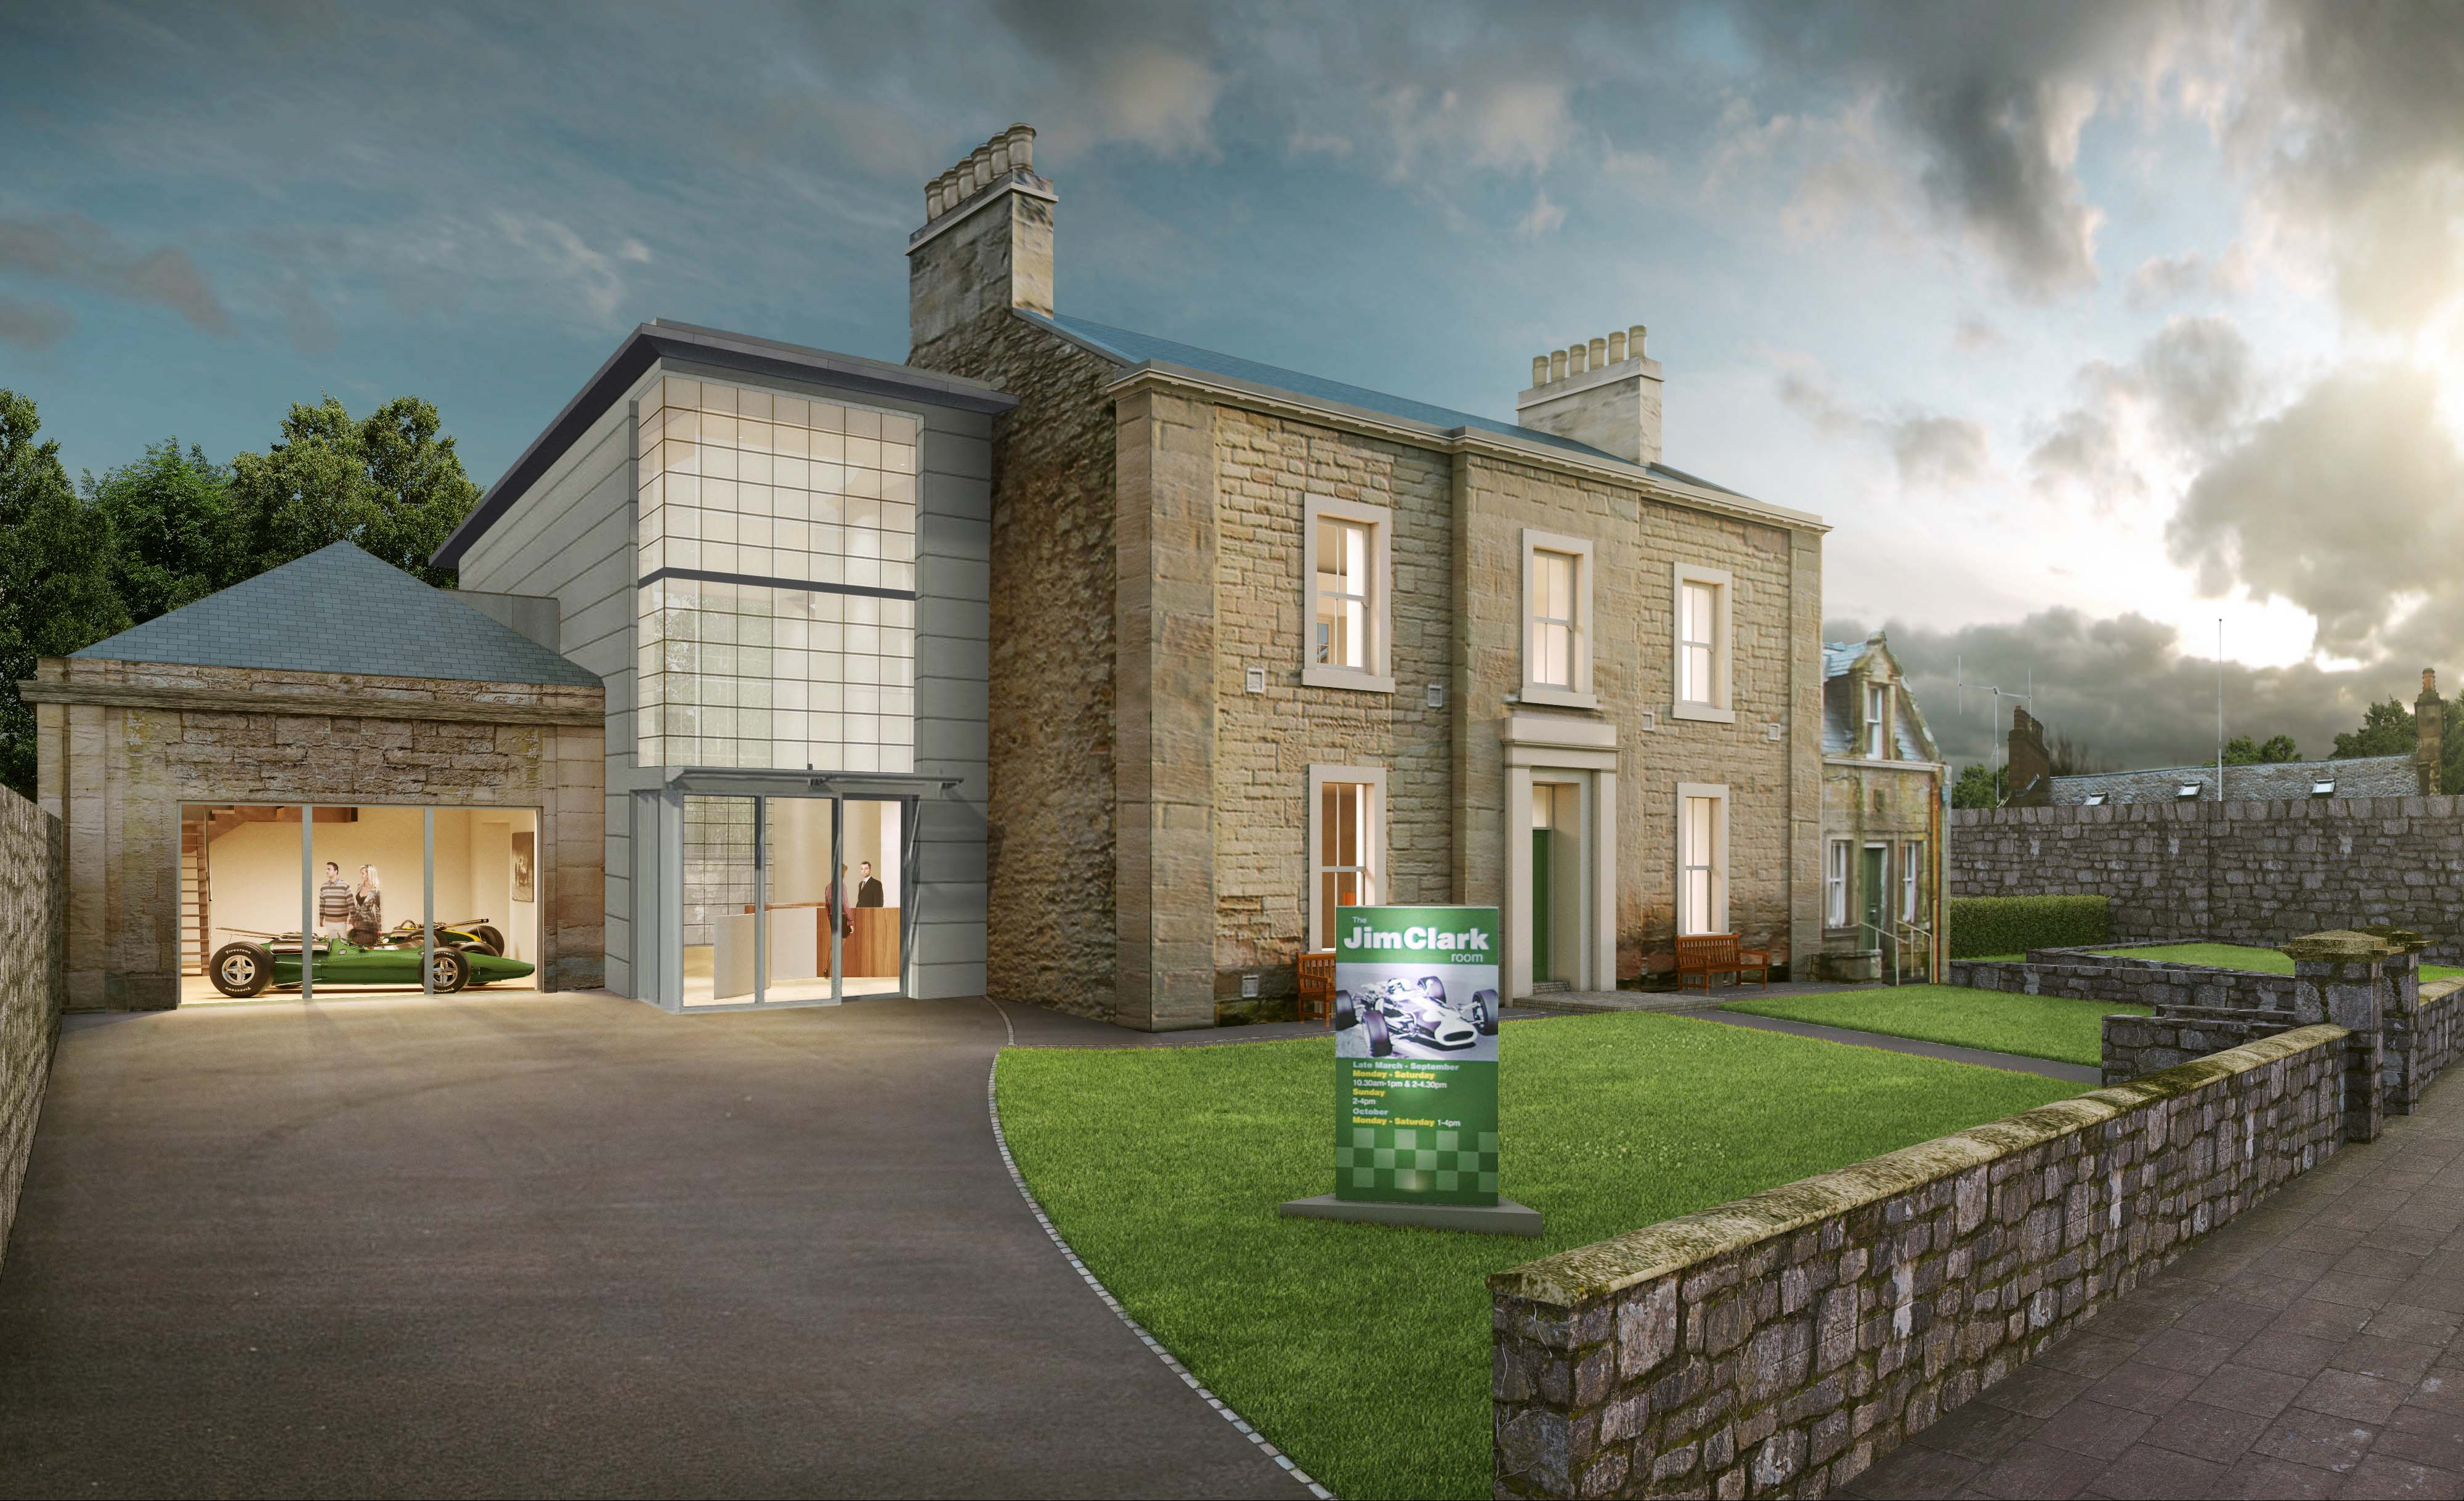 New Jim Clark Museum concept image (lr)   The Edinburgh Reporter